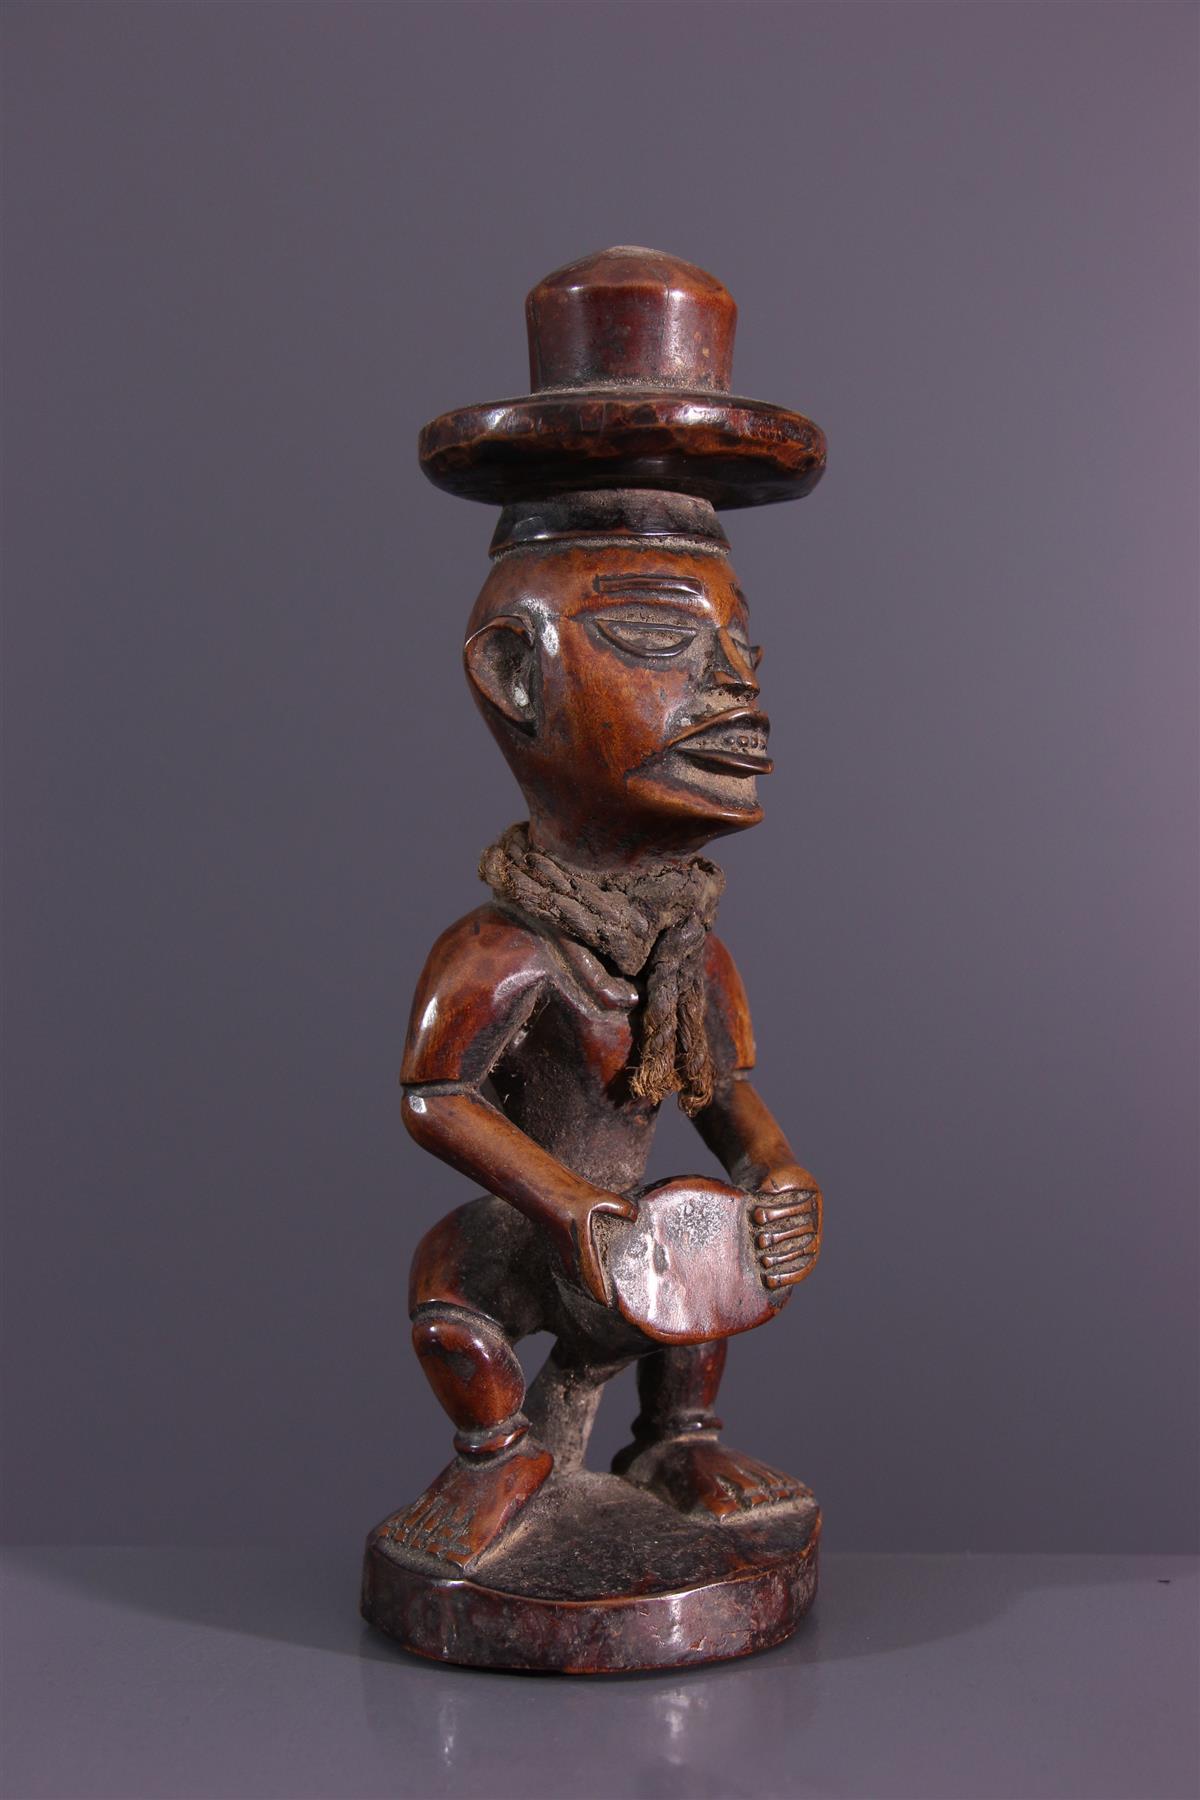 Statuette - Art africain